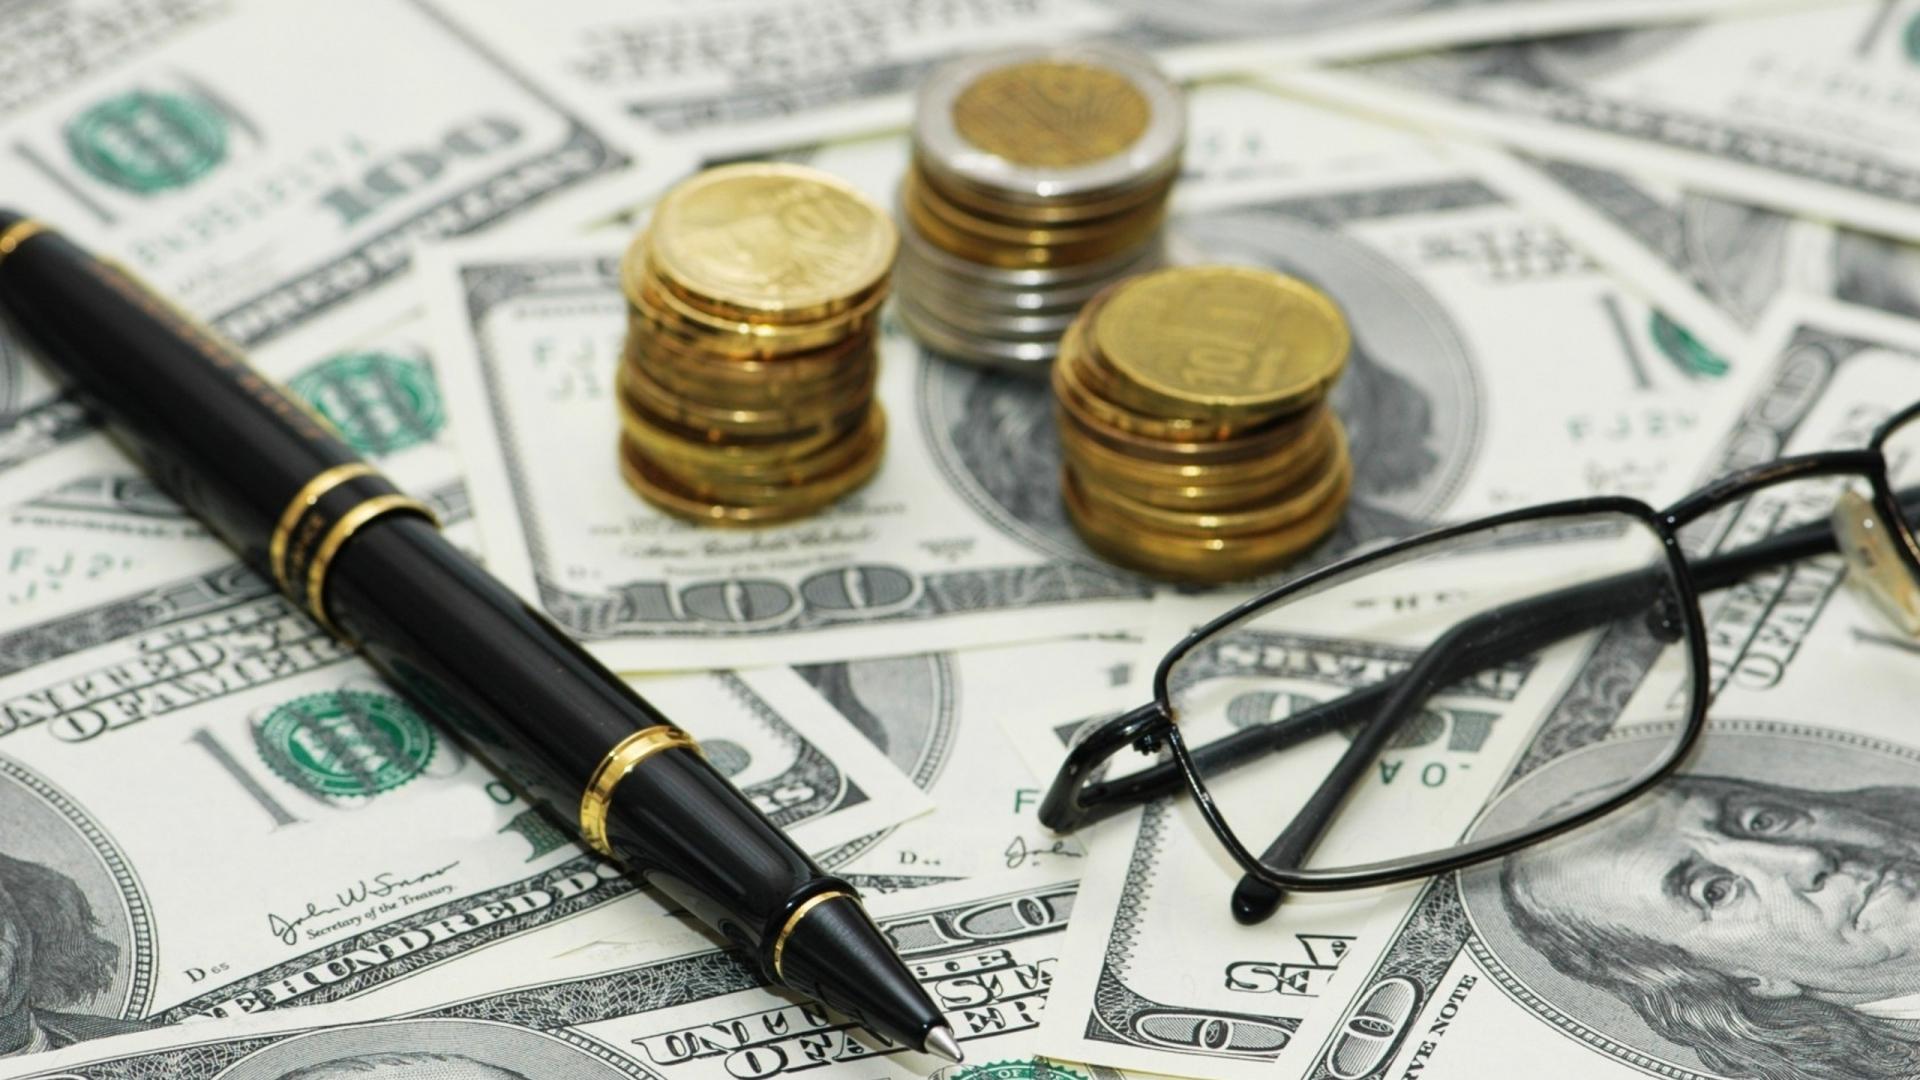 money_bills_coins_pen_glasses_95906_1920x1080